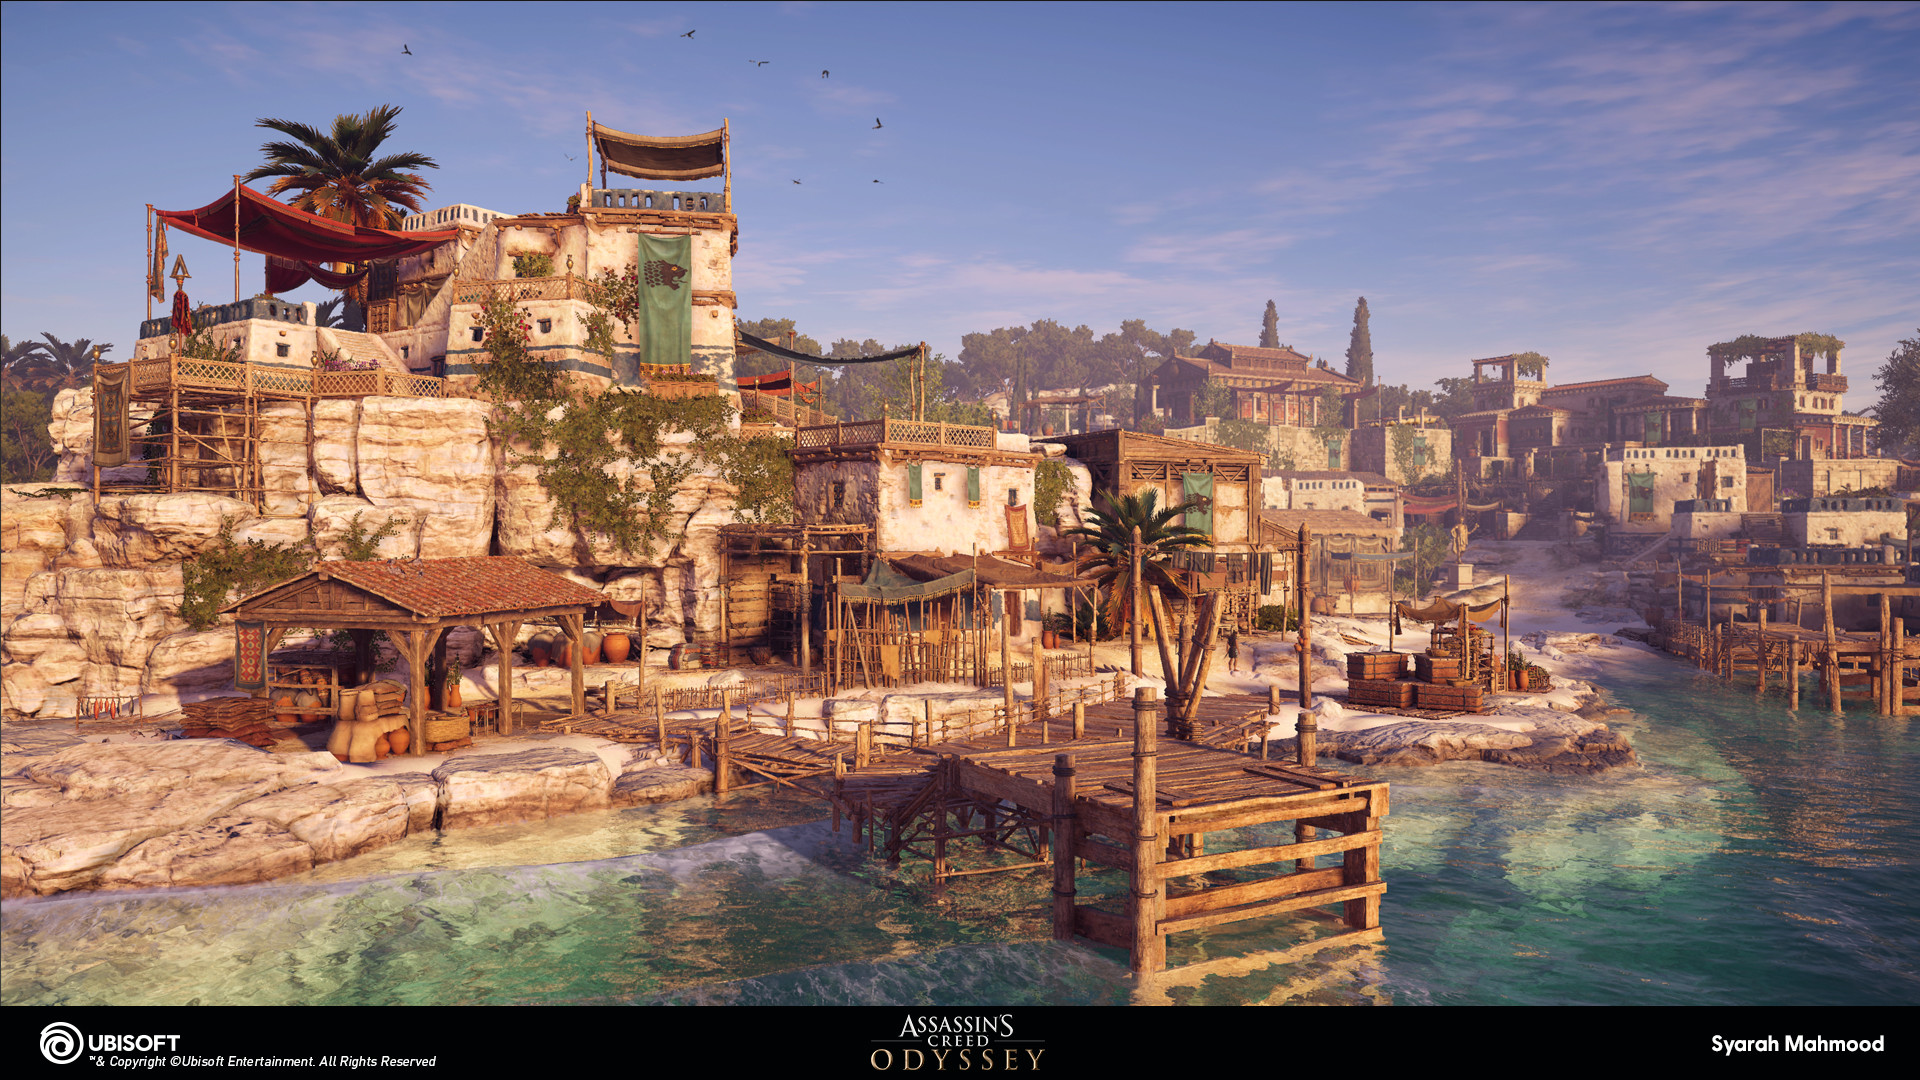 Syarah Mahmood Assassin S Creed Odyssey Kos Samos Kythera Islands